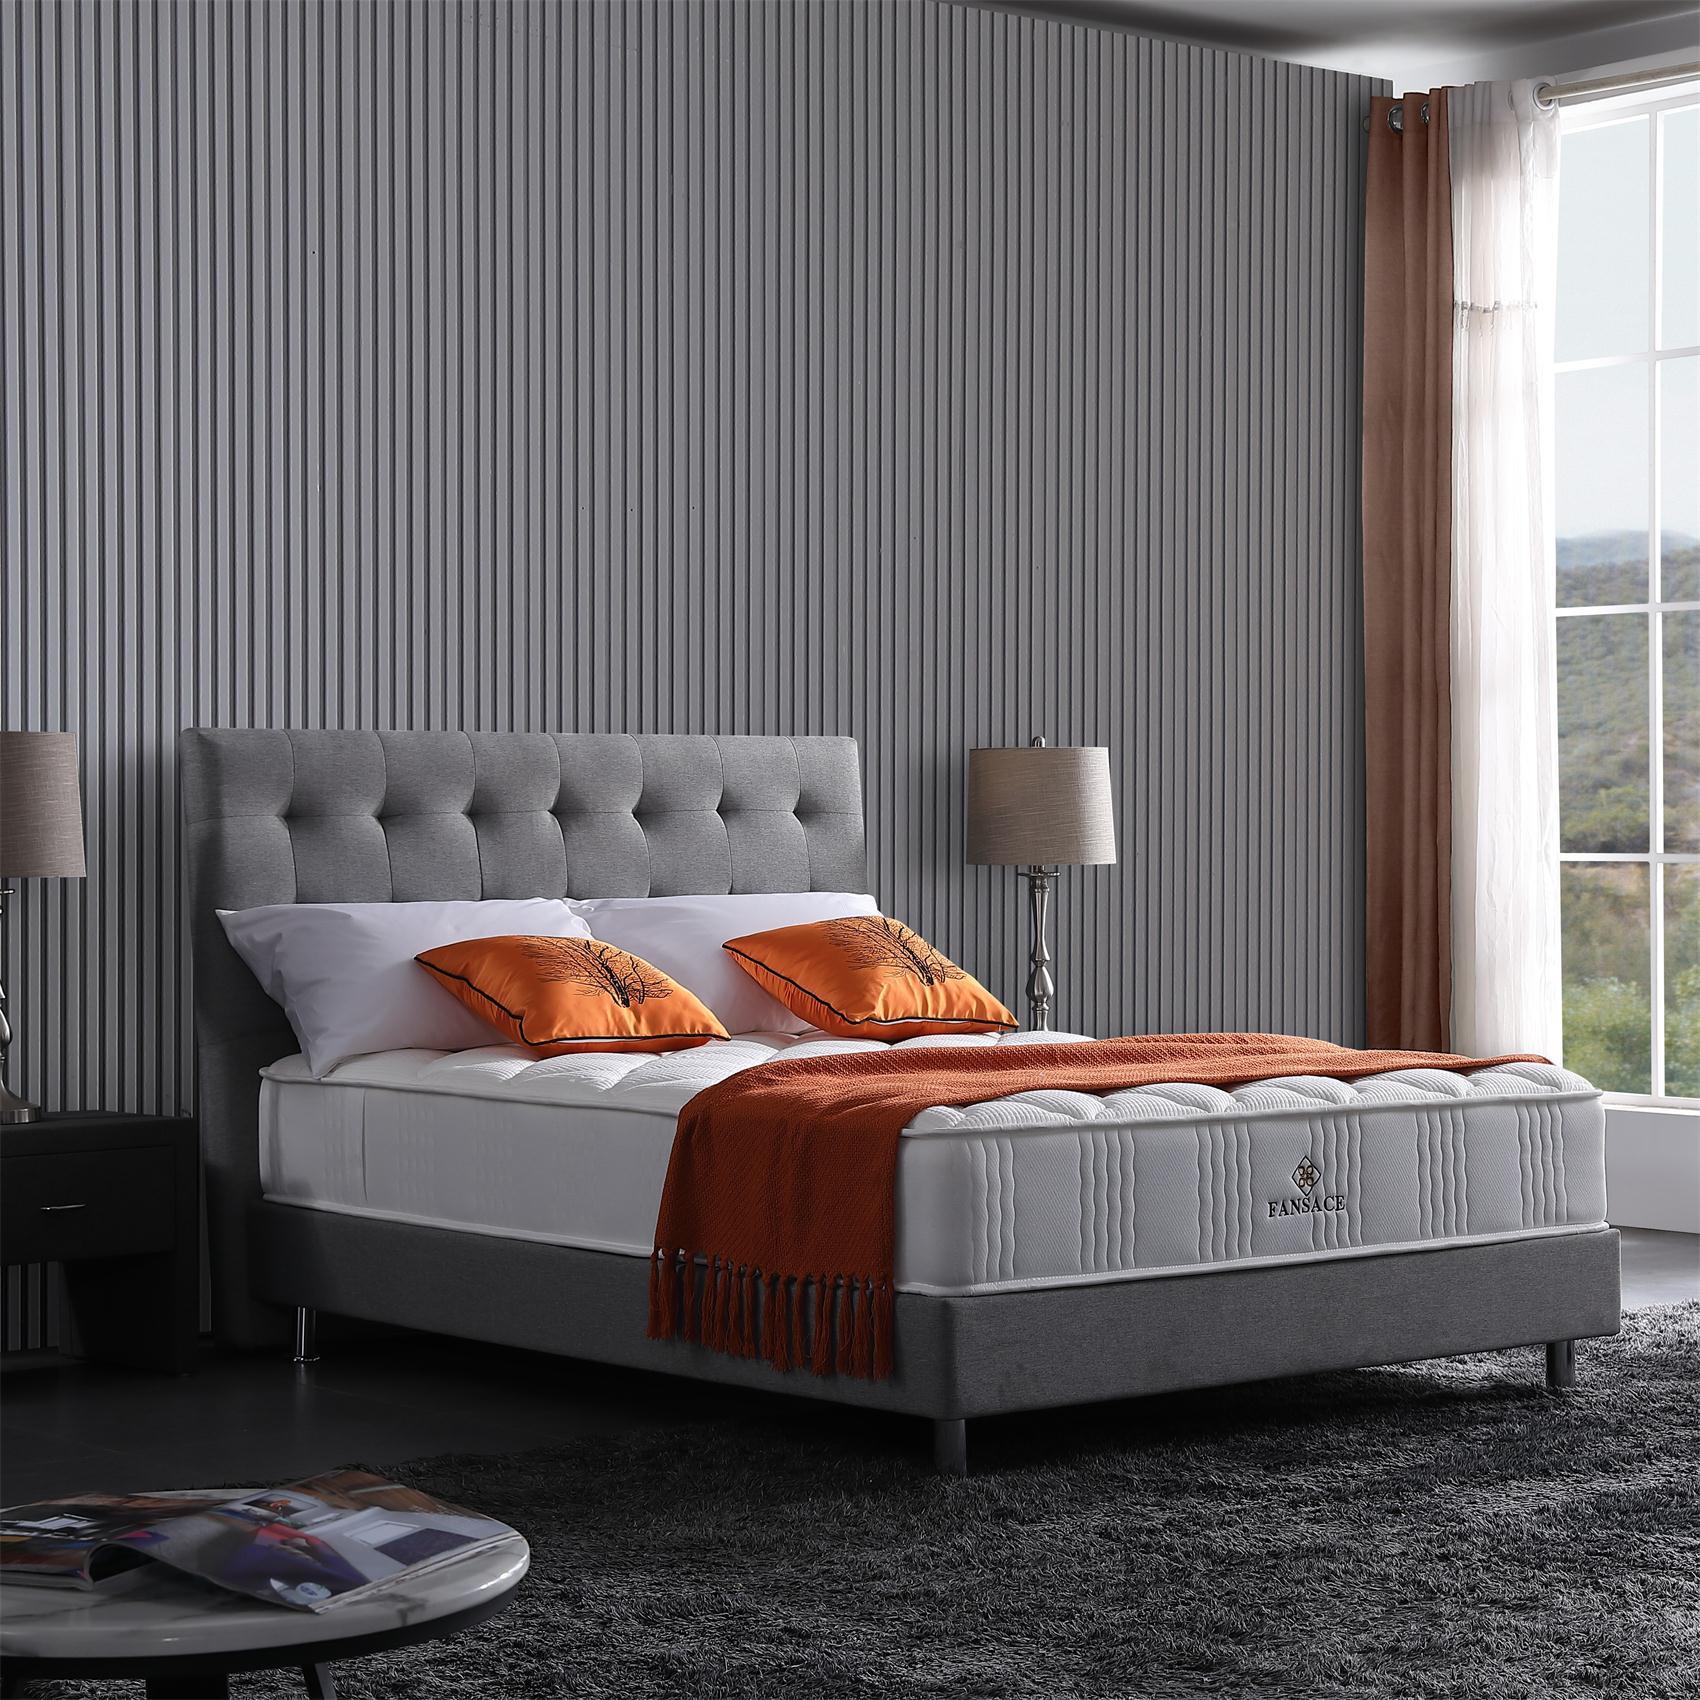 mattress world using price for tavern-2